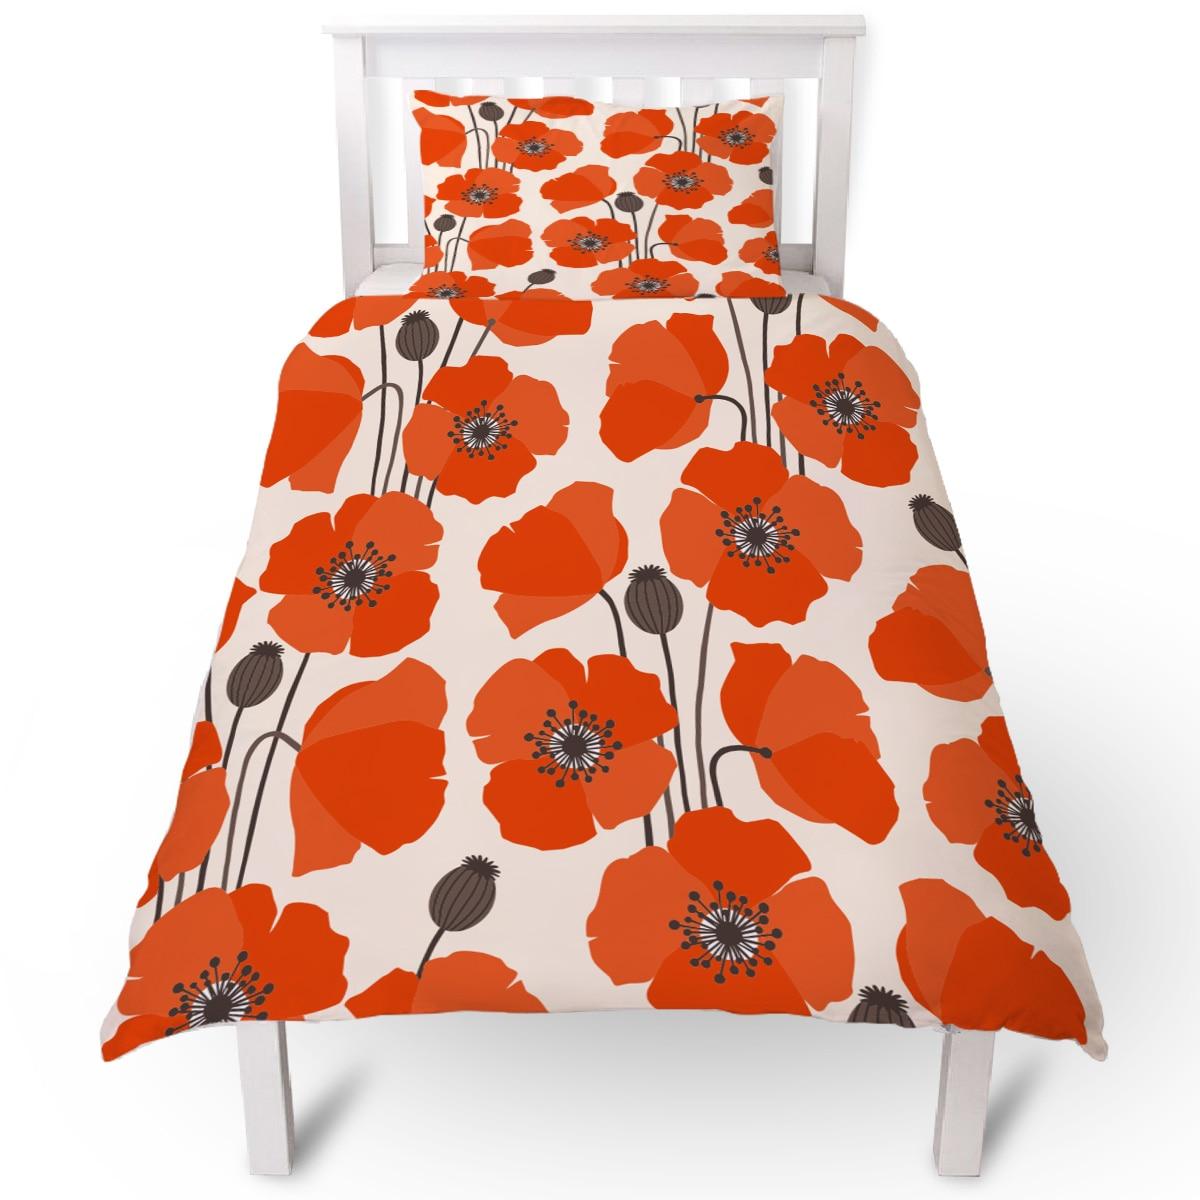 Flower Orange Poppy Duvet Cover Pillow Case Quilt Cover Set Bedclothes Single Bedding Sets For Bed